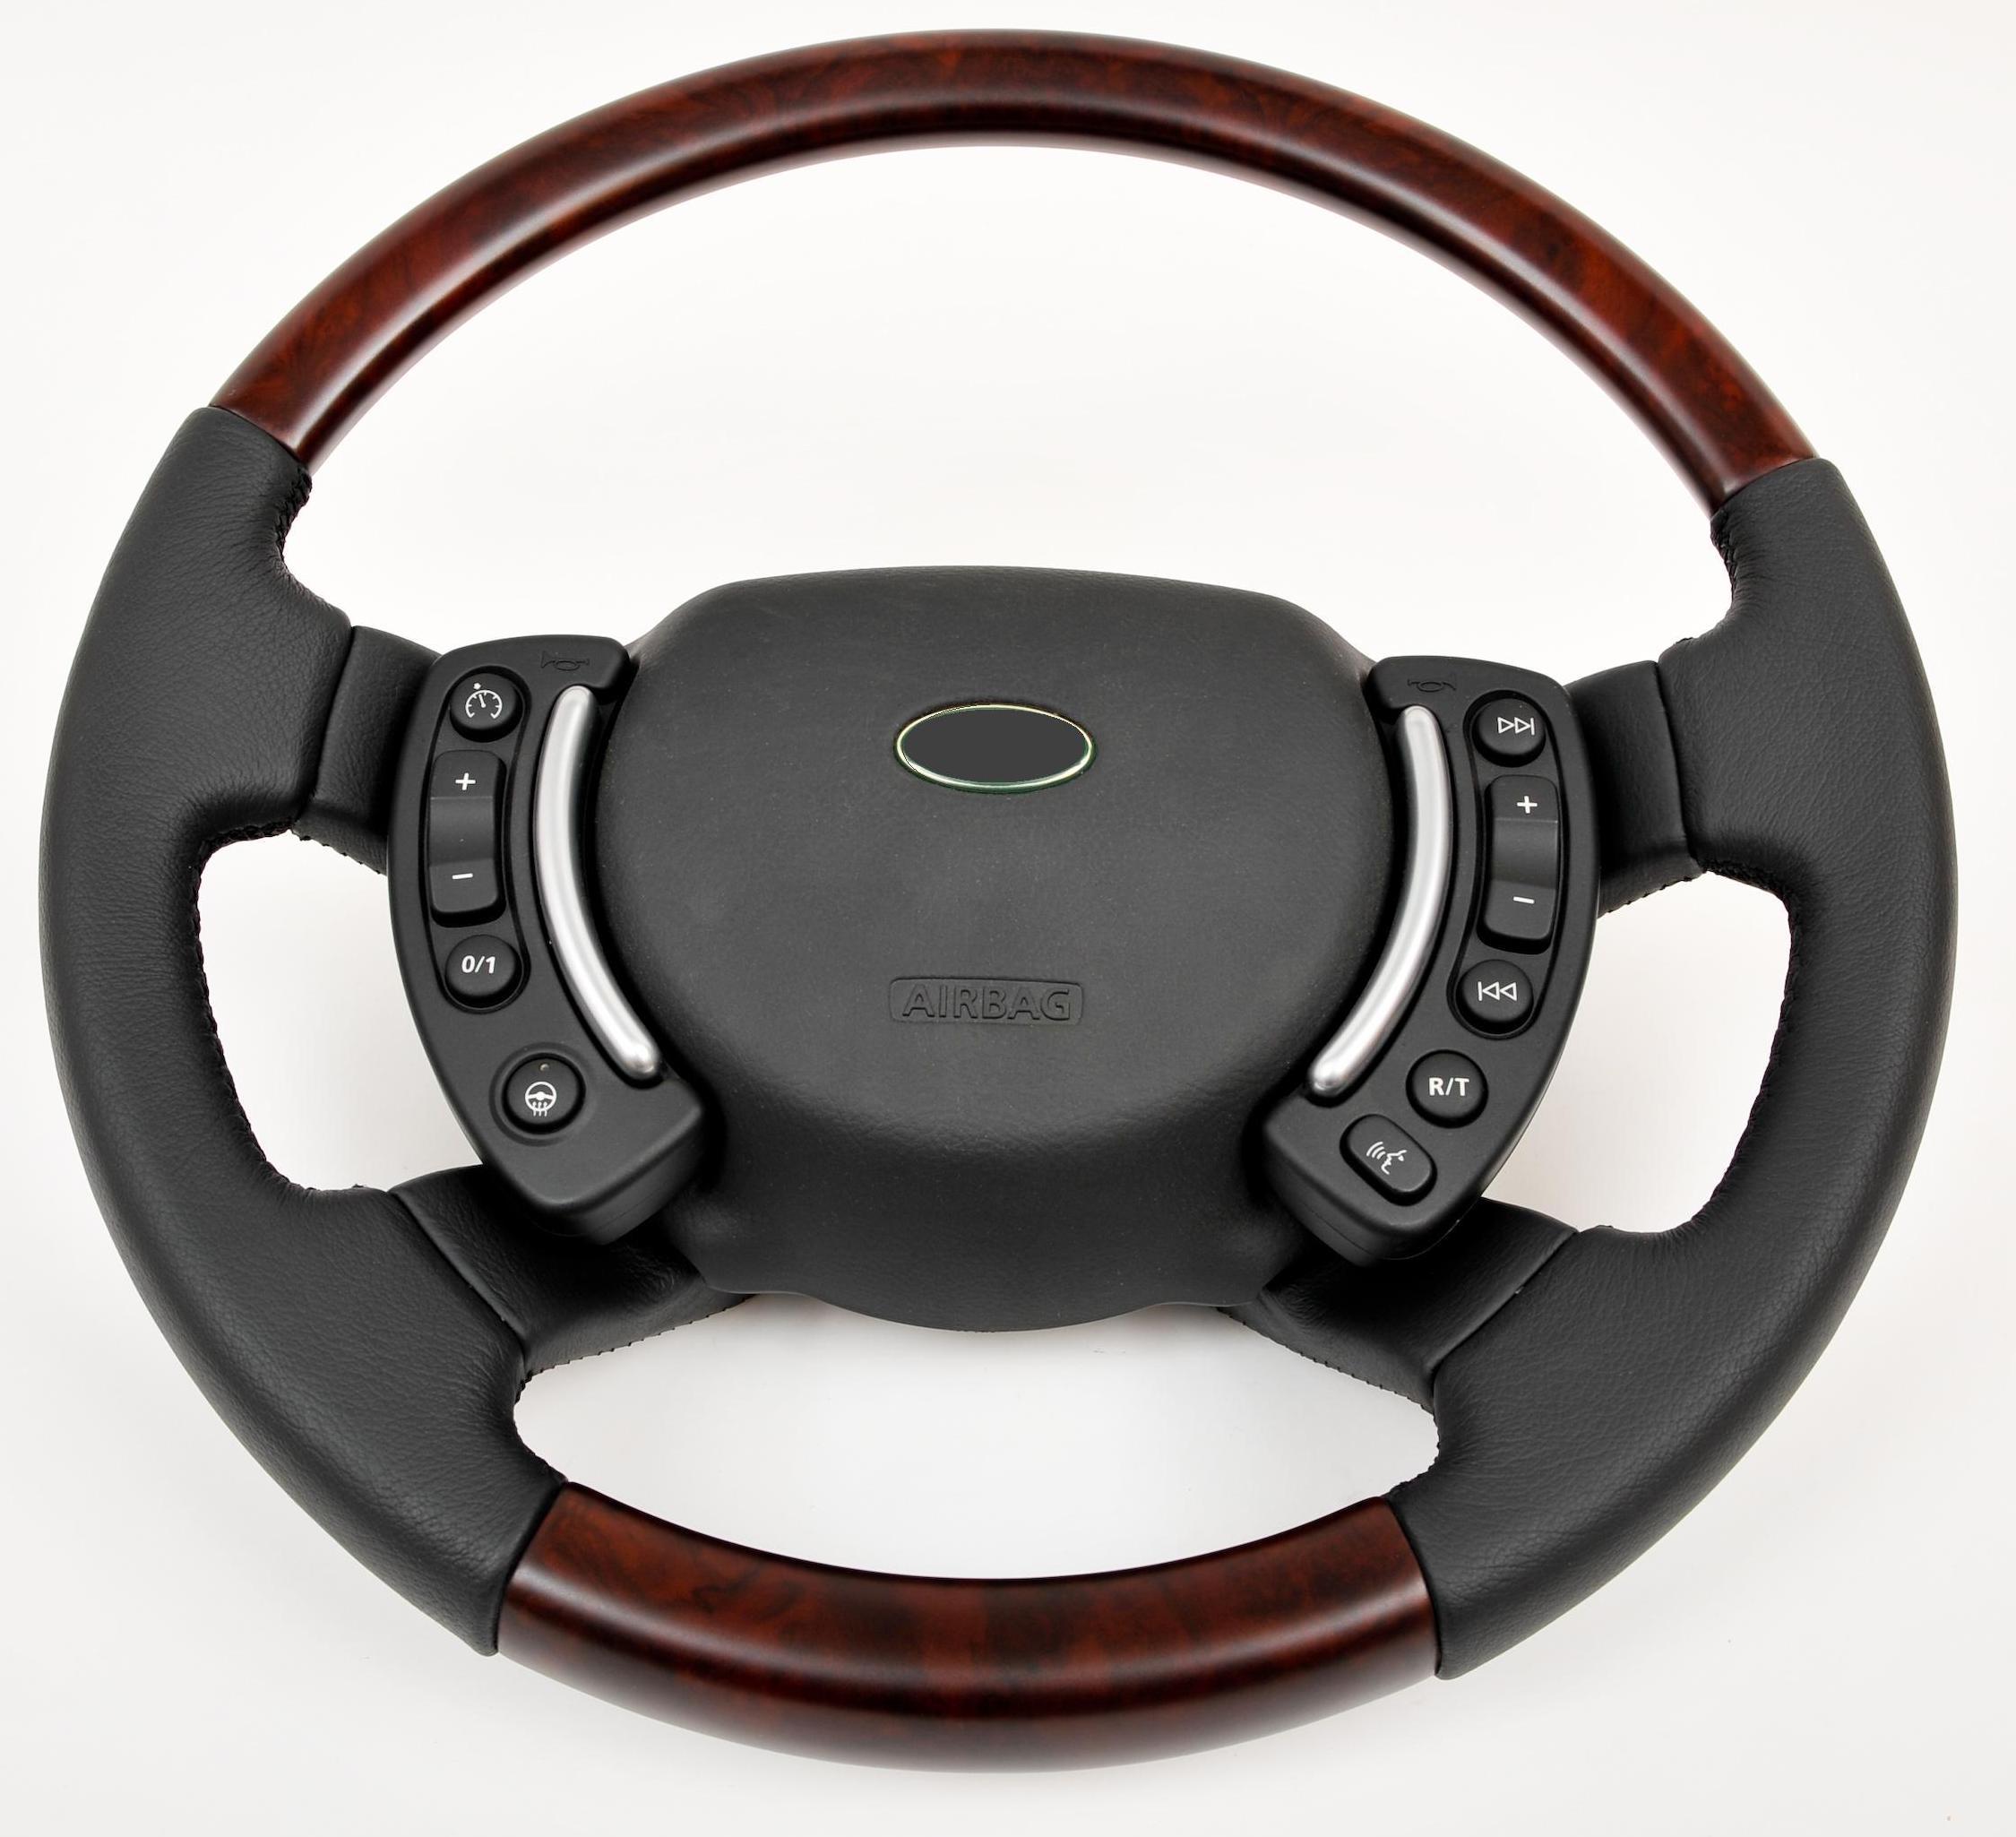 Steering Wheel Walnut & Nappa Leather Range Rover L322